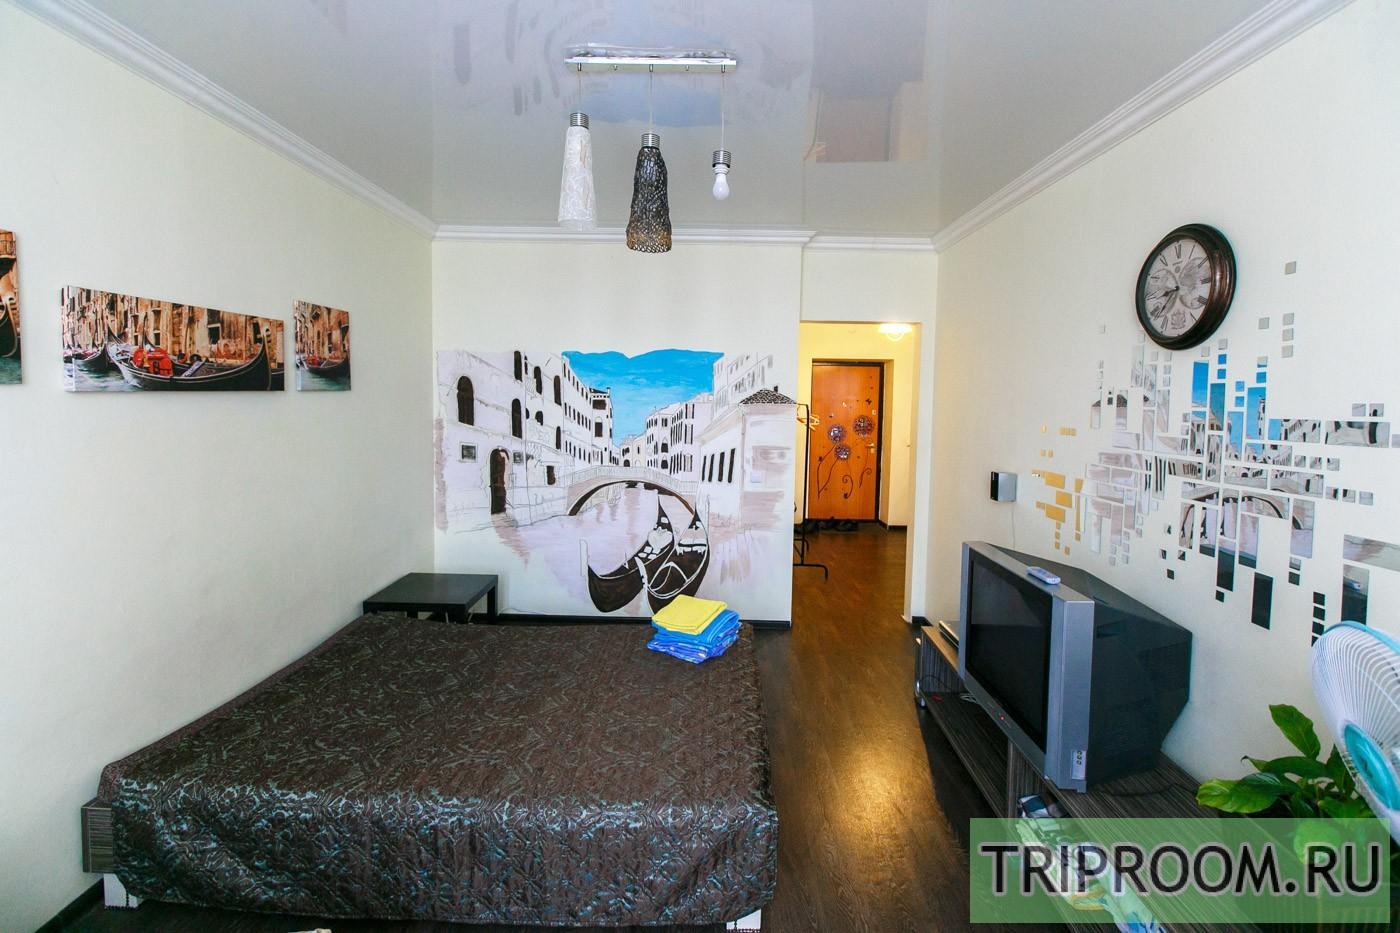 1-комнатная квартира посуточно (вариант № 28539), ул. П.И. Смородина, фото № 2